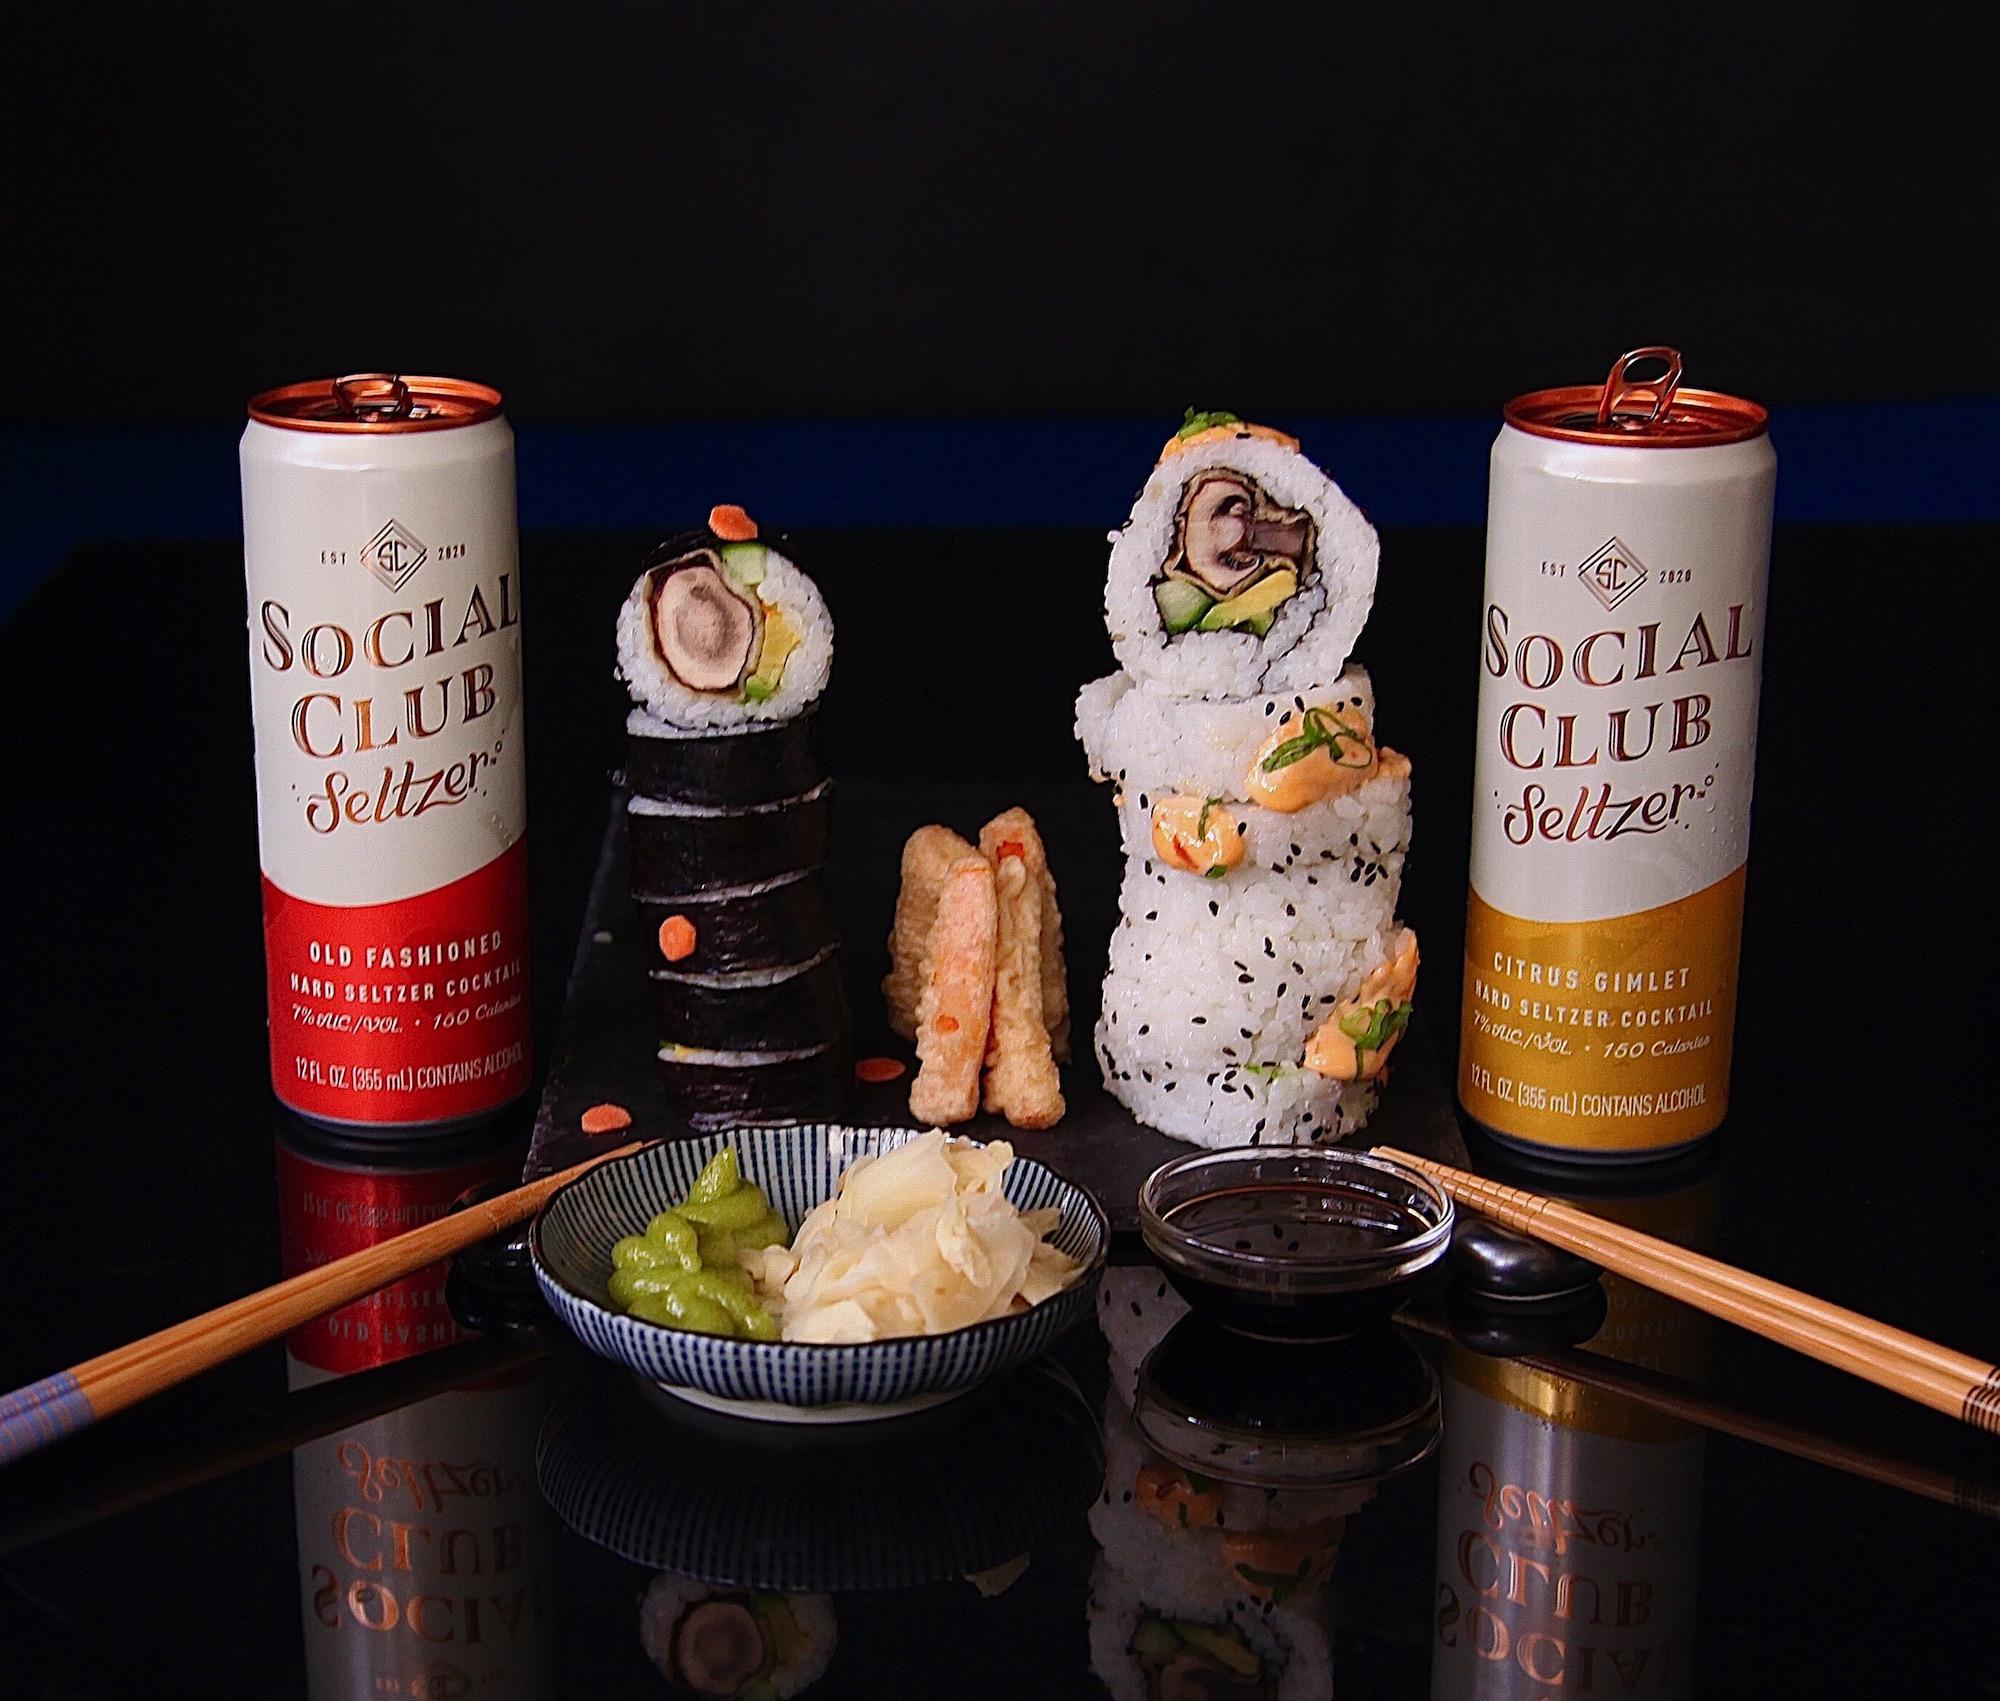 Mushroom Tempura Sushi #SocialClubRecipe